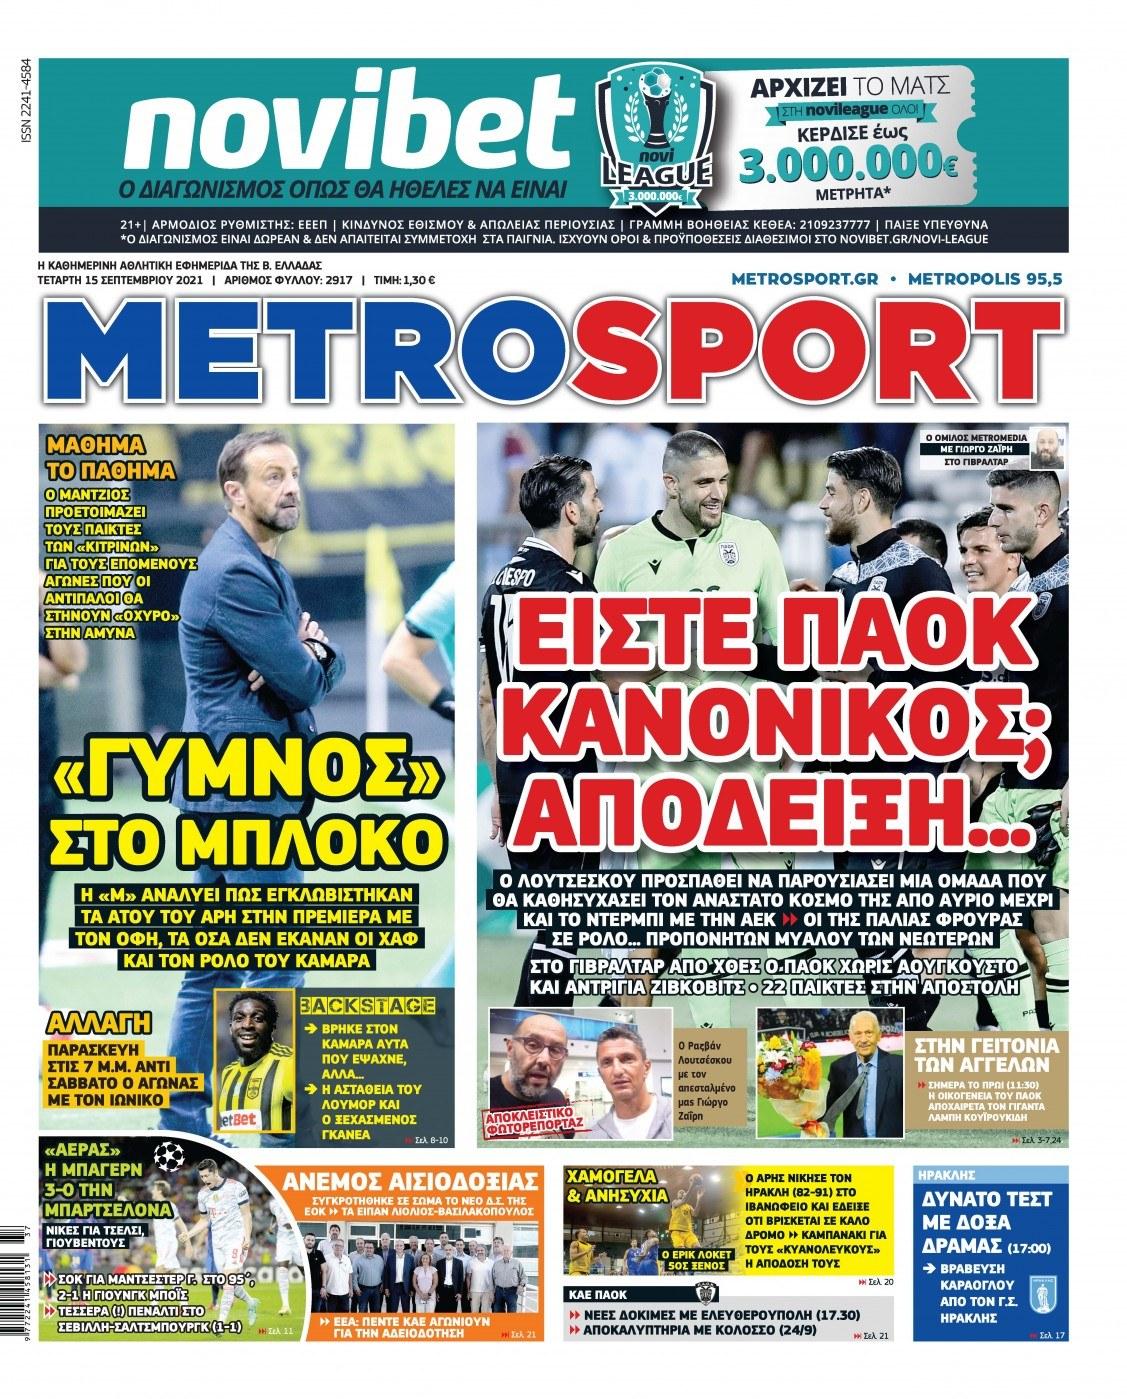 Metrosport 15.9